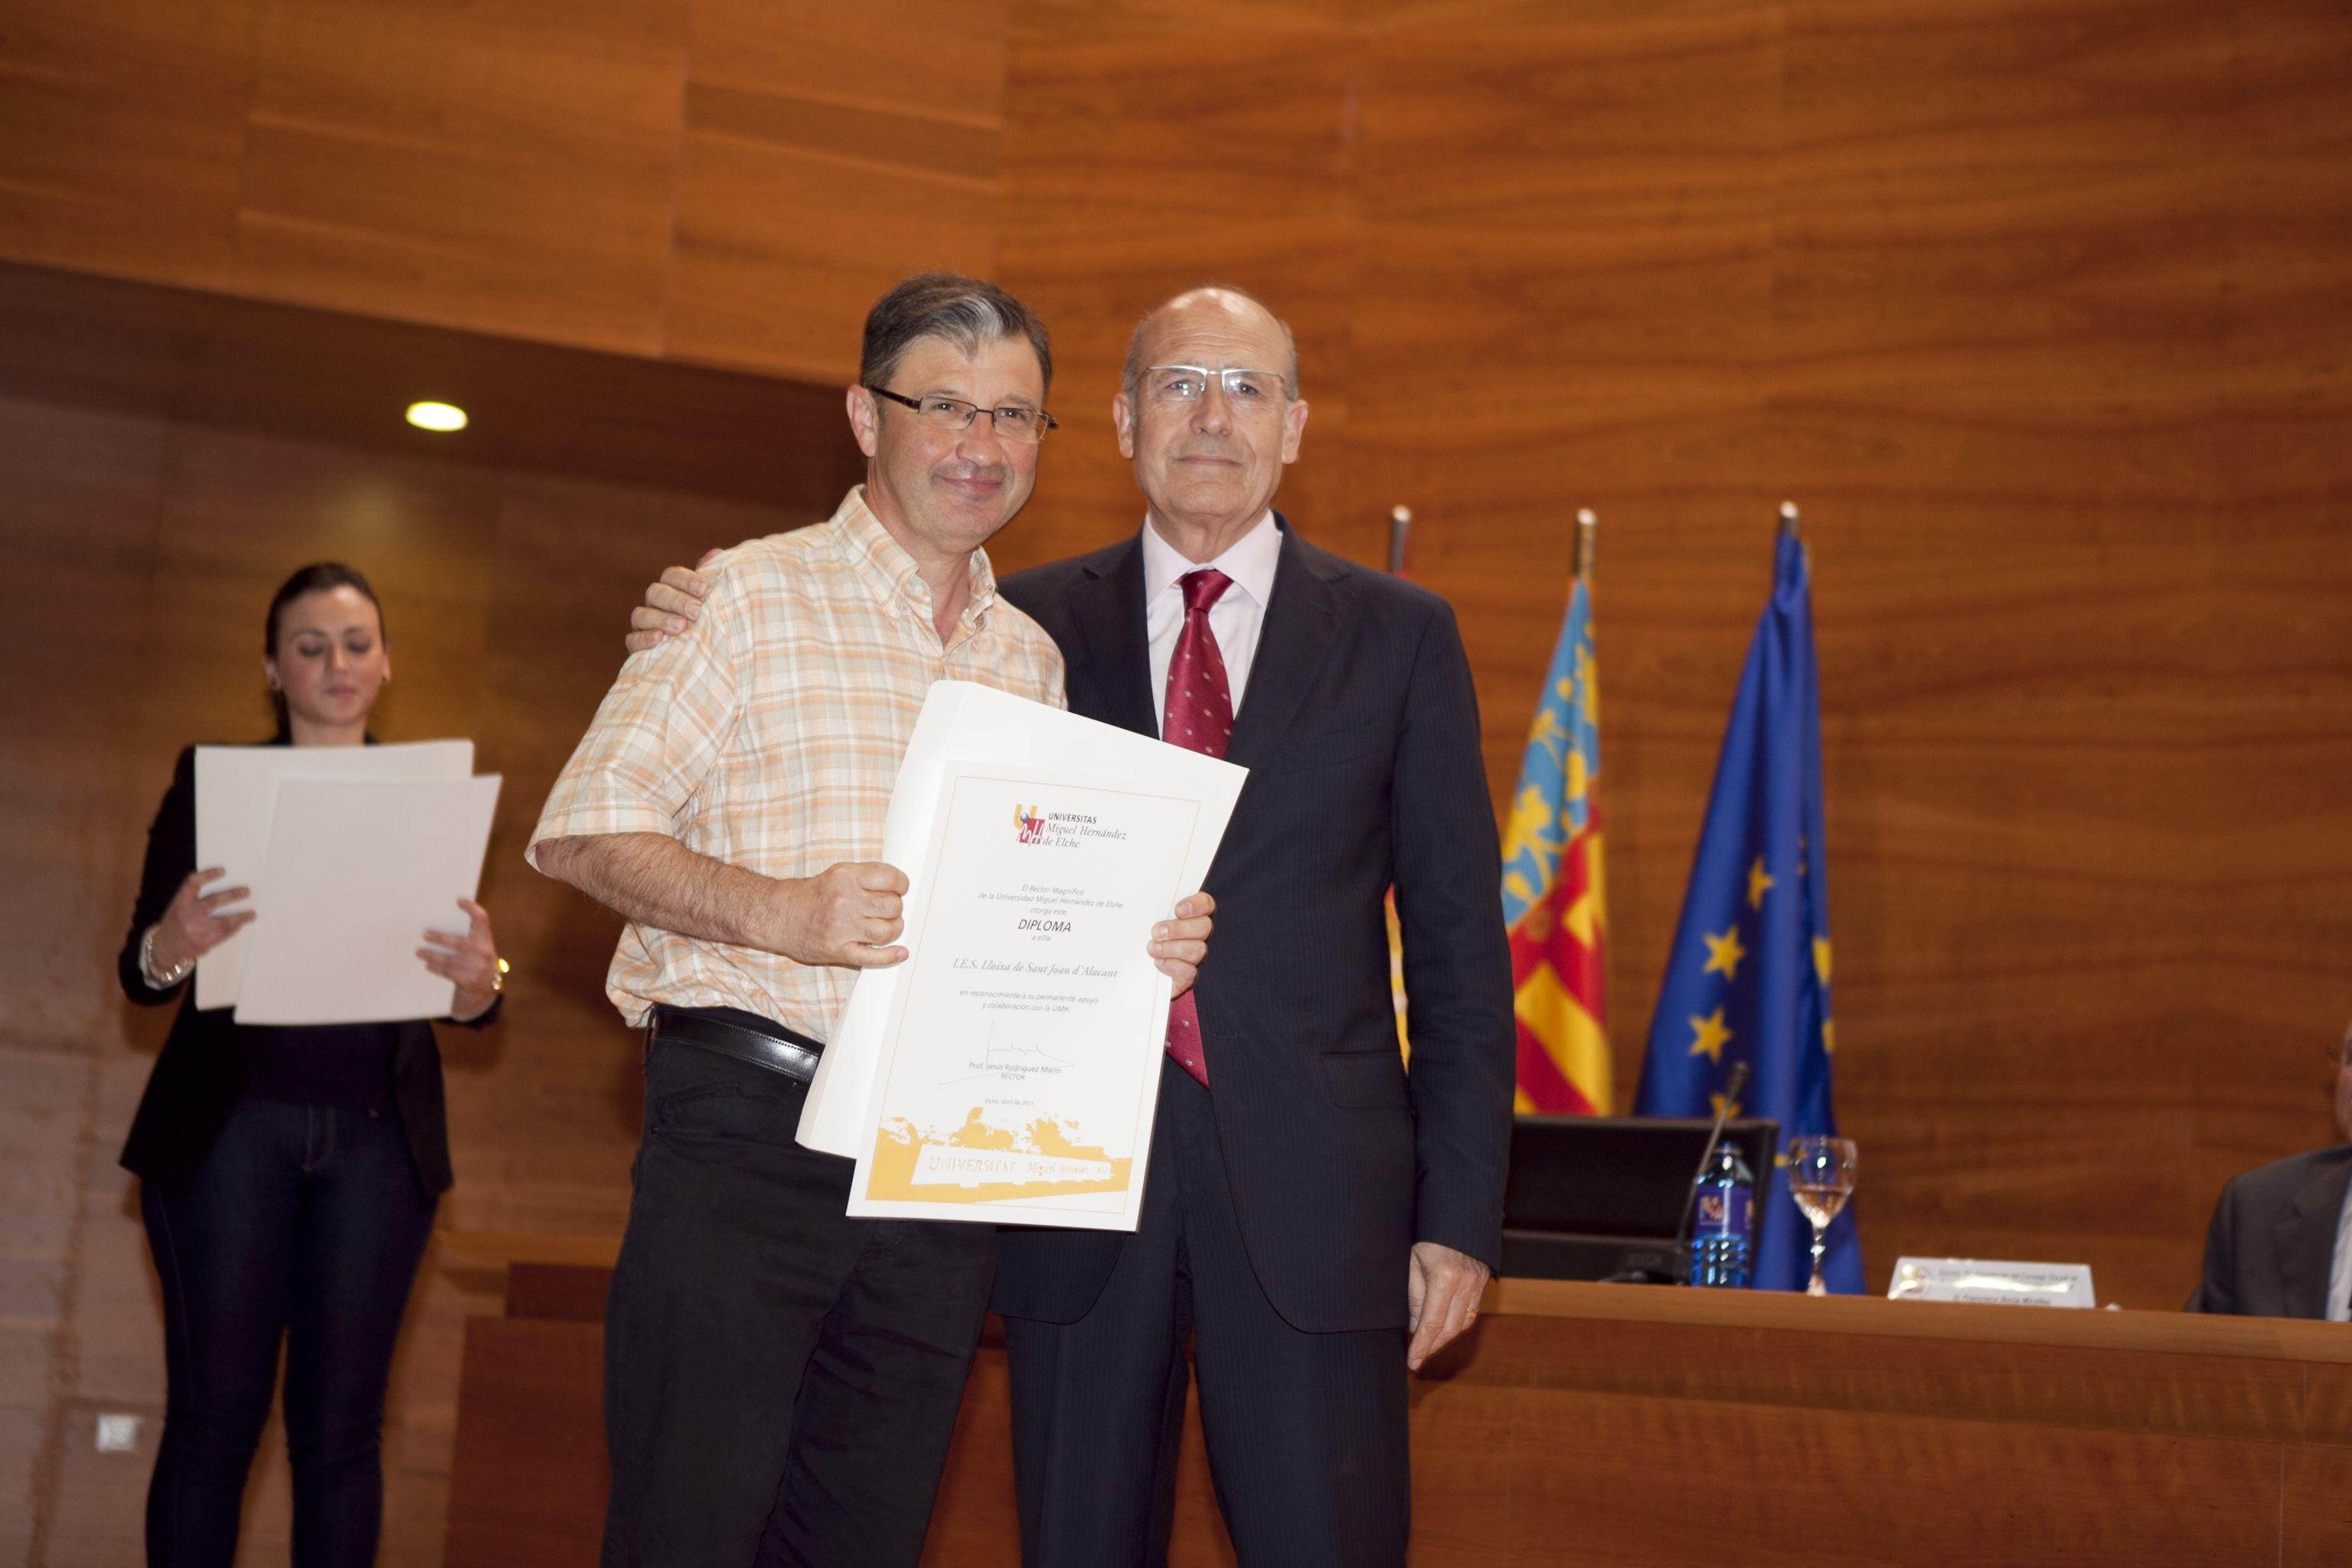 umh-diplomas-rector_mg_6701.jpg